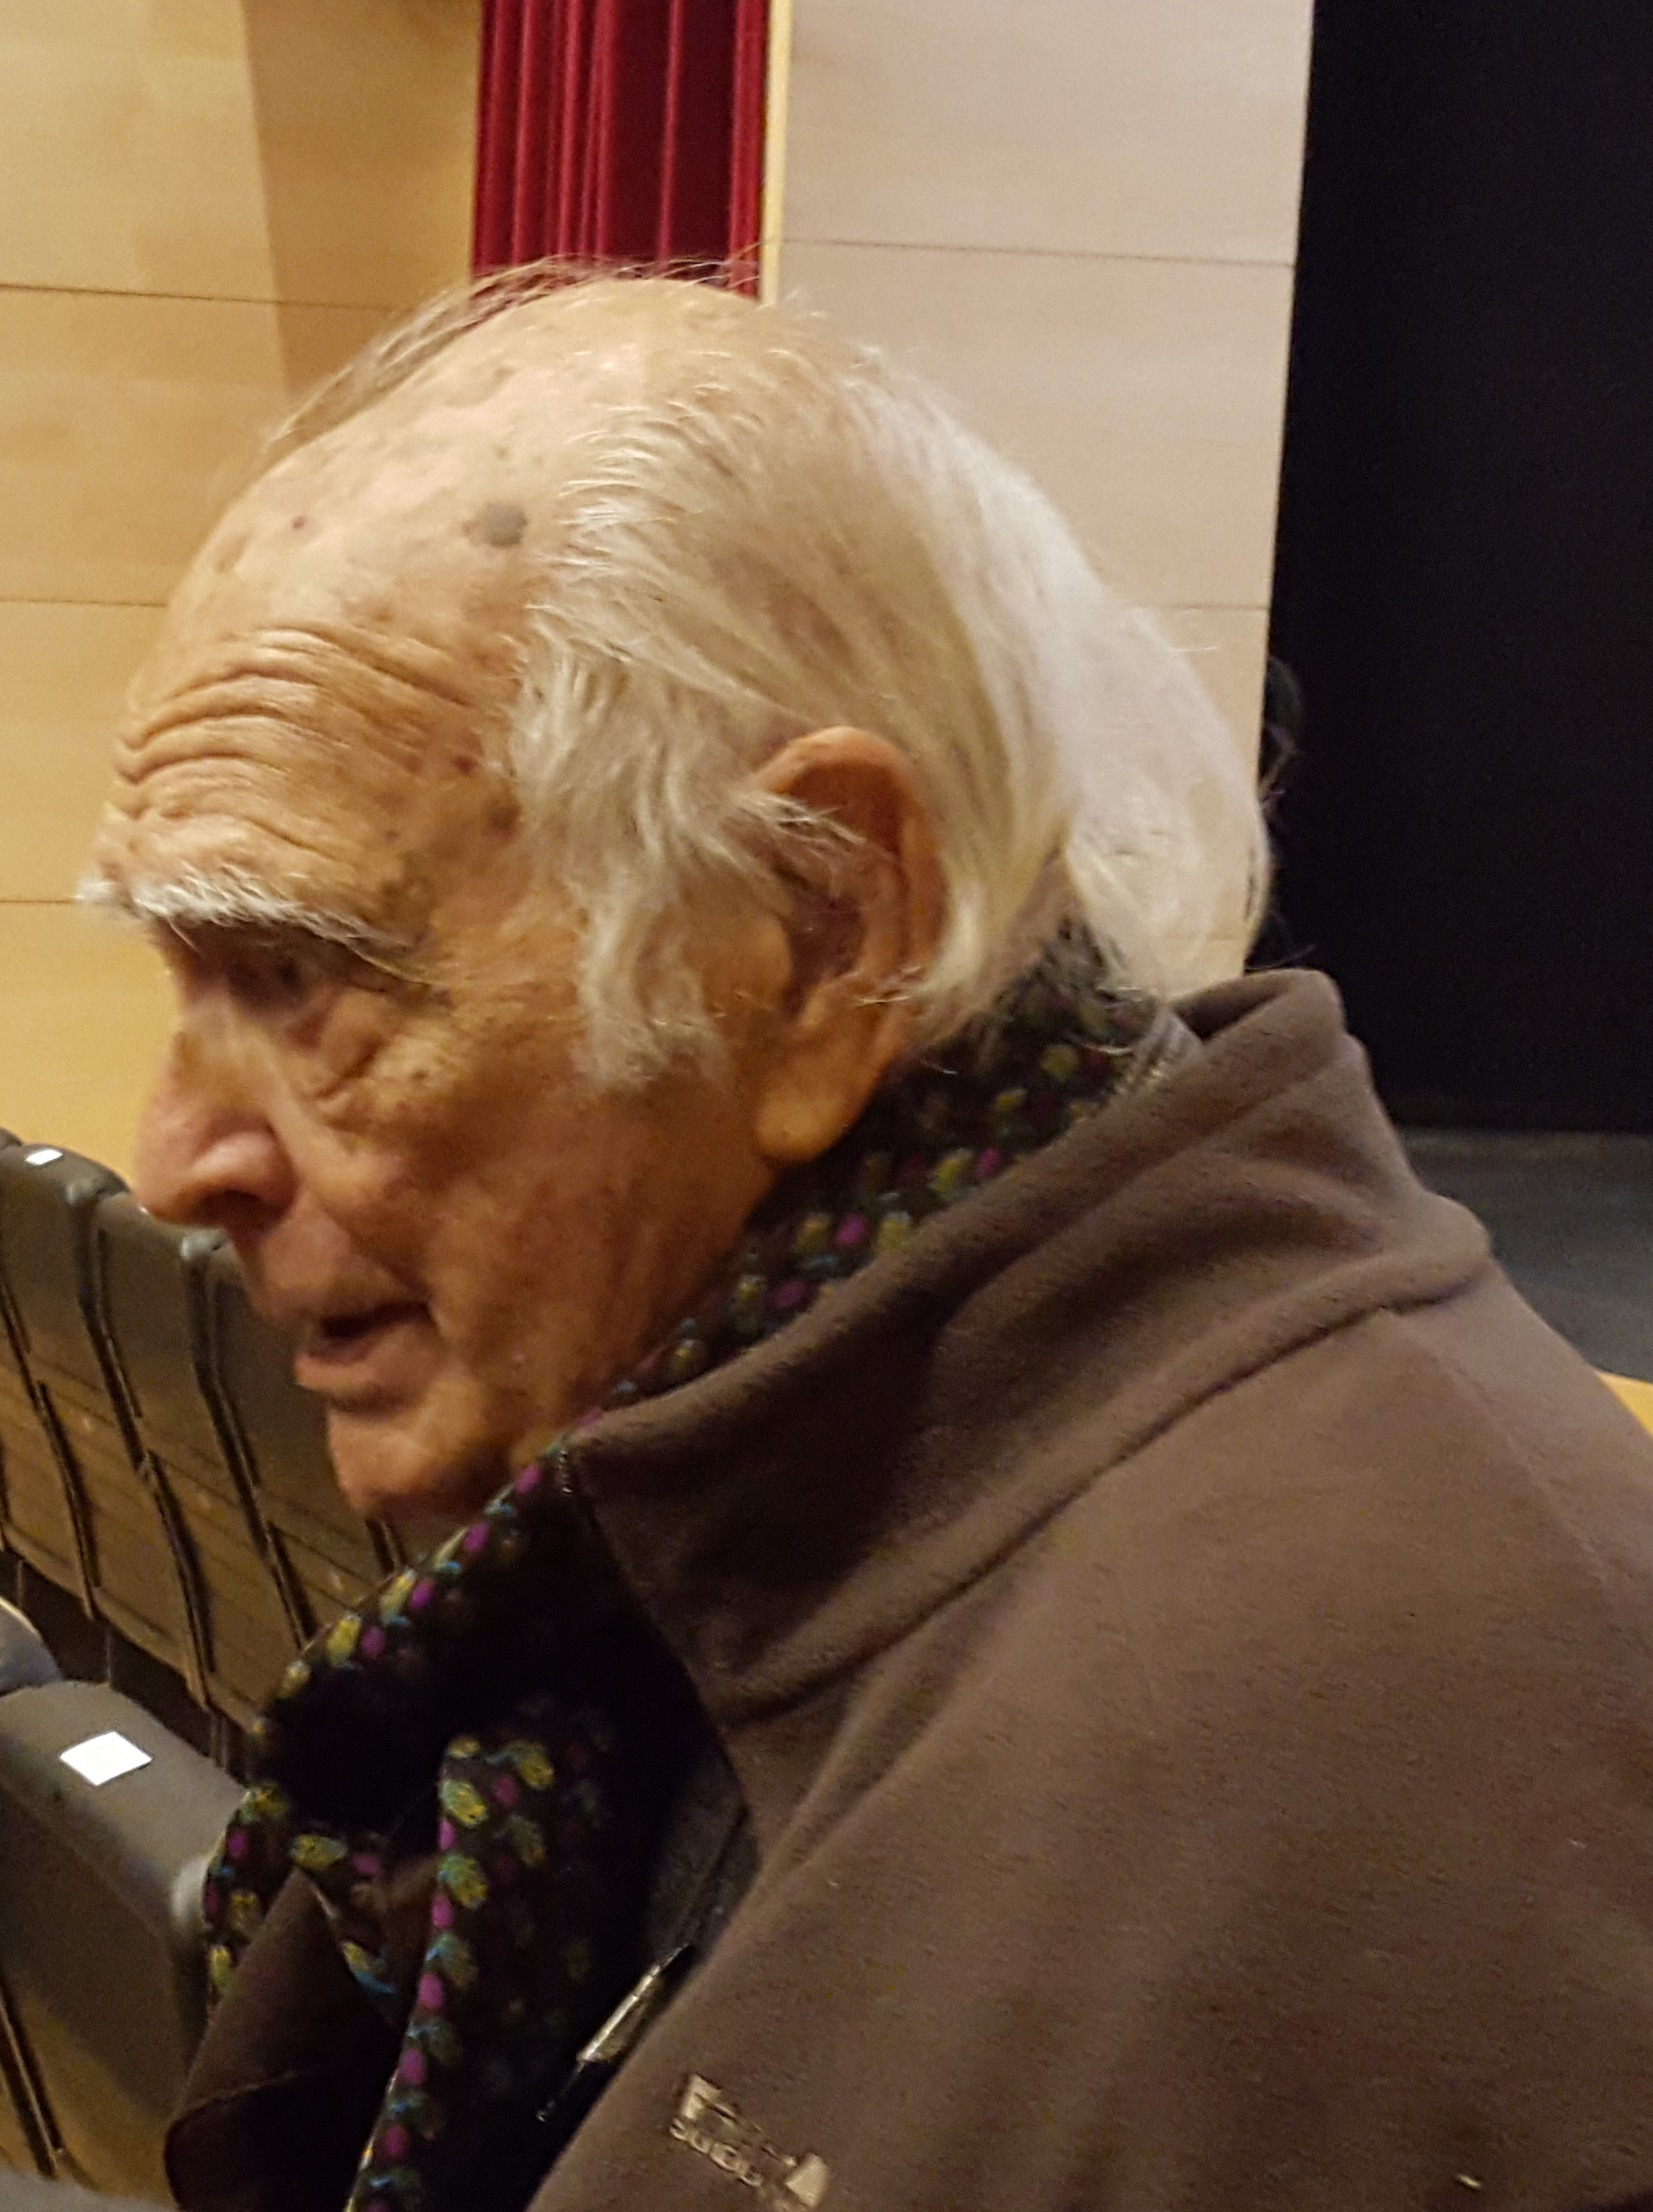 Antonio Isasi Issasmendi